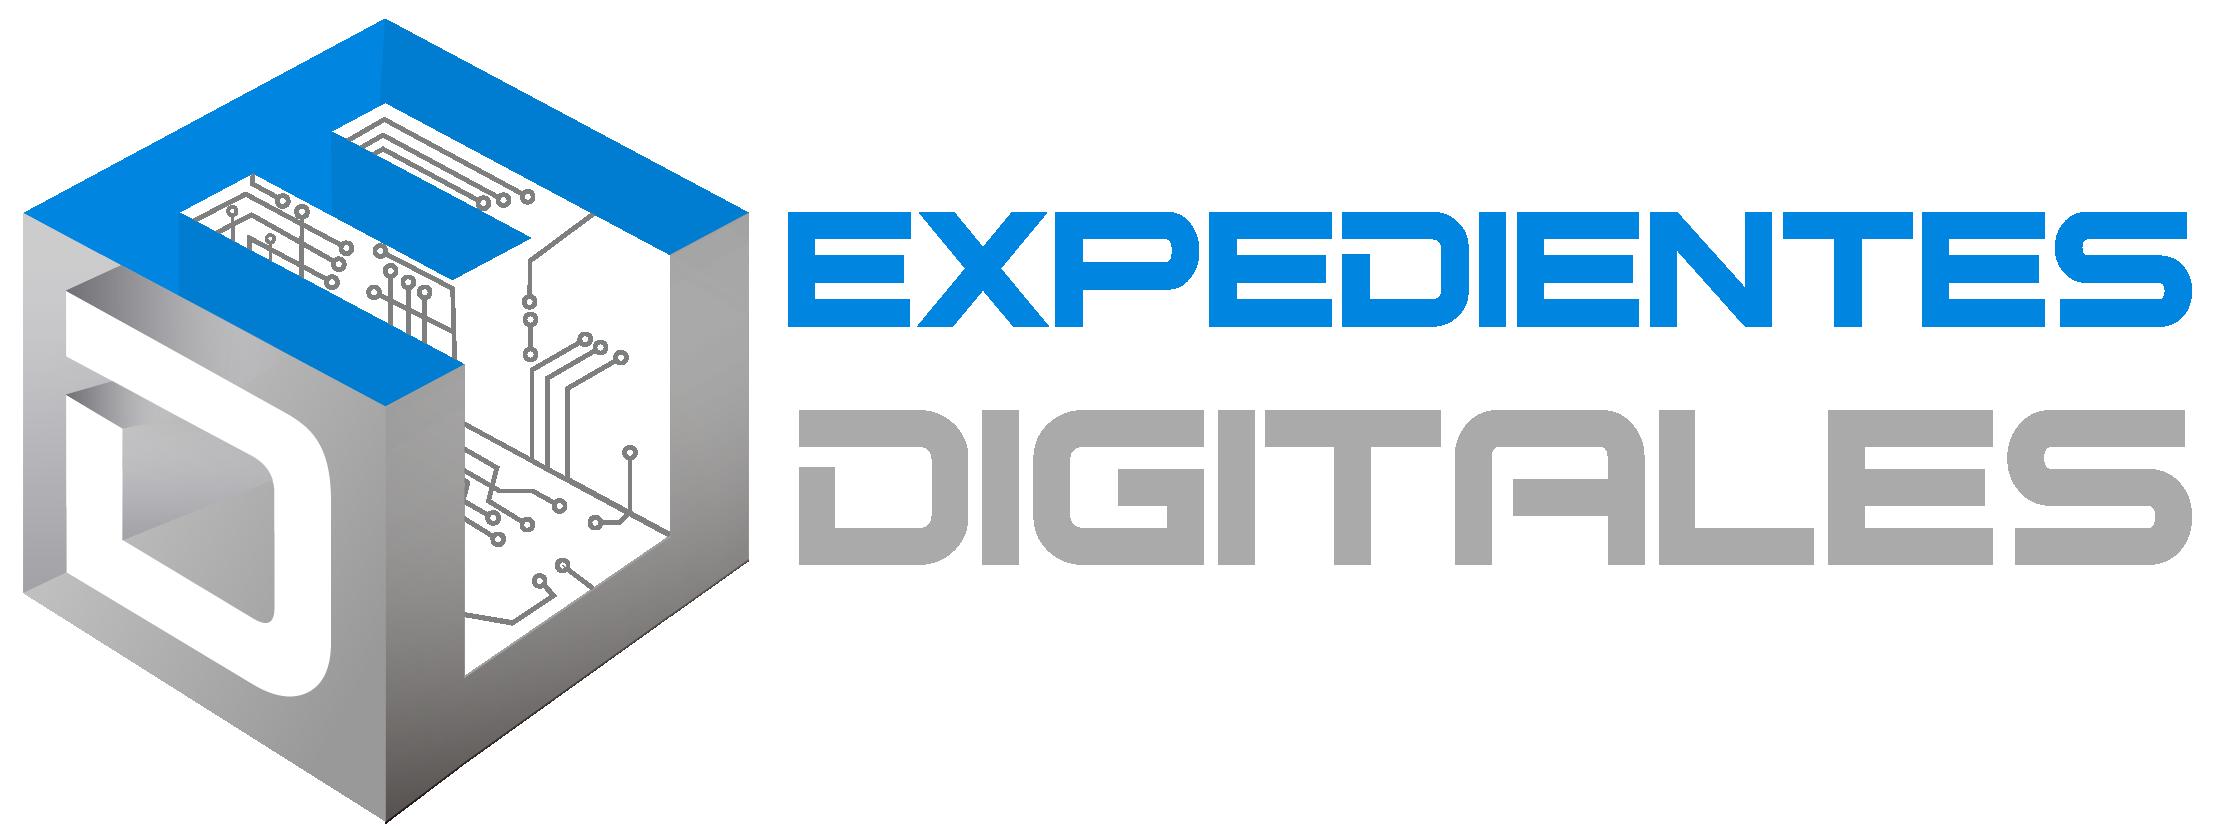 Expedientes Digitales